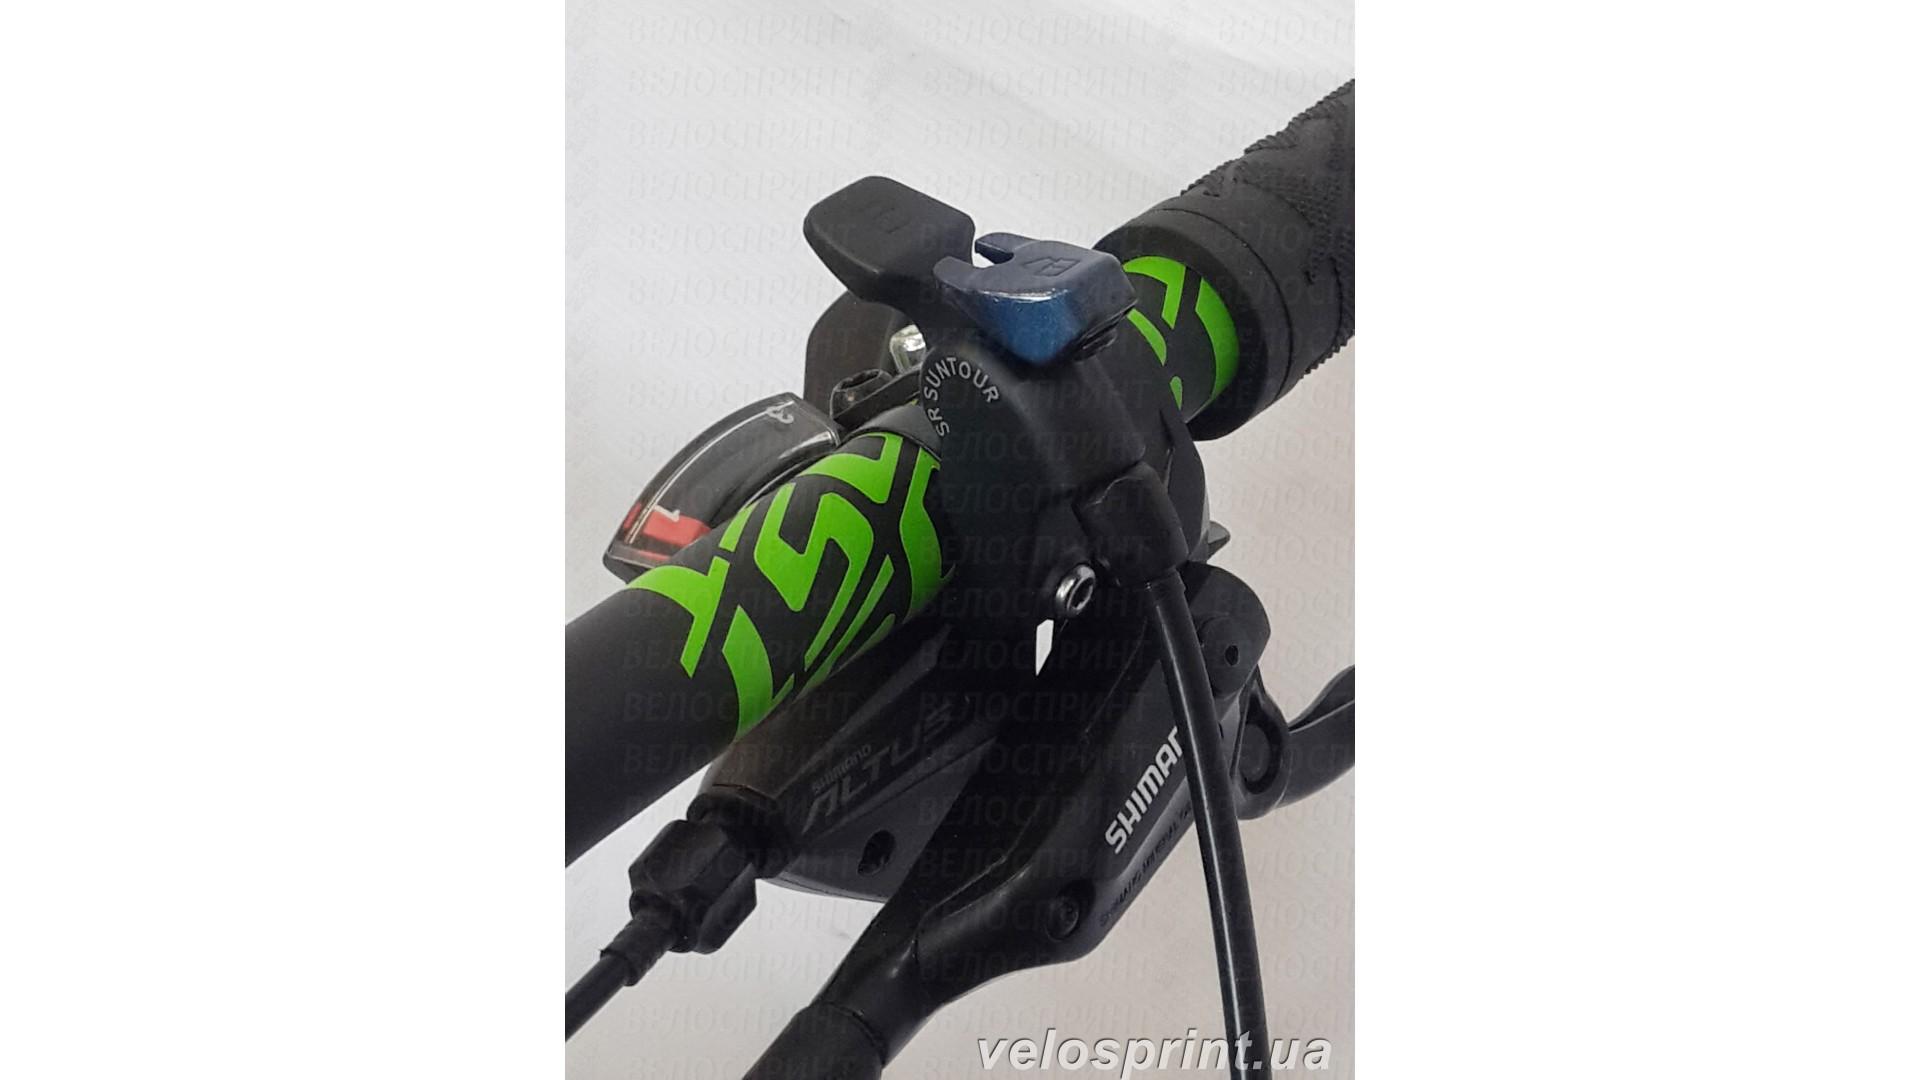 Велосипед GHOST Kato 3 green/darkgreen/black блокировка вилки вид1год 2016